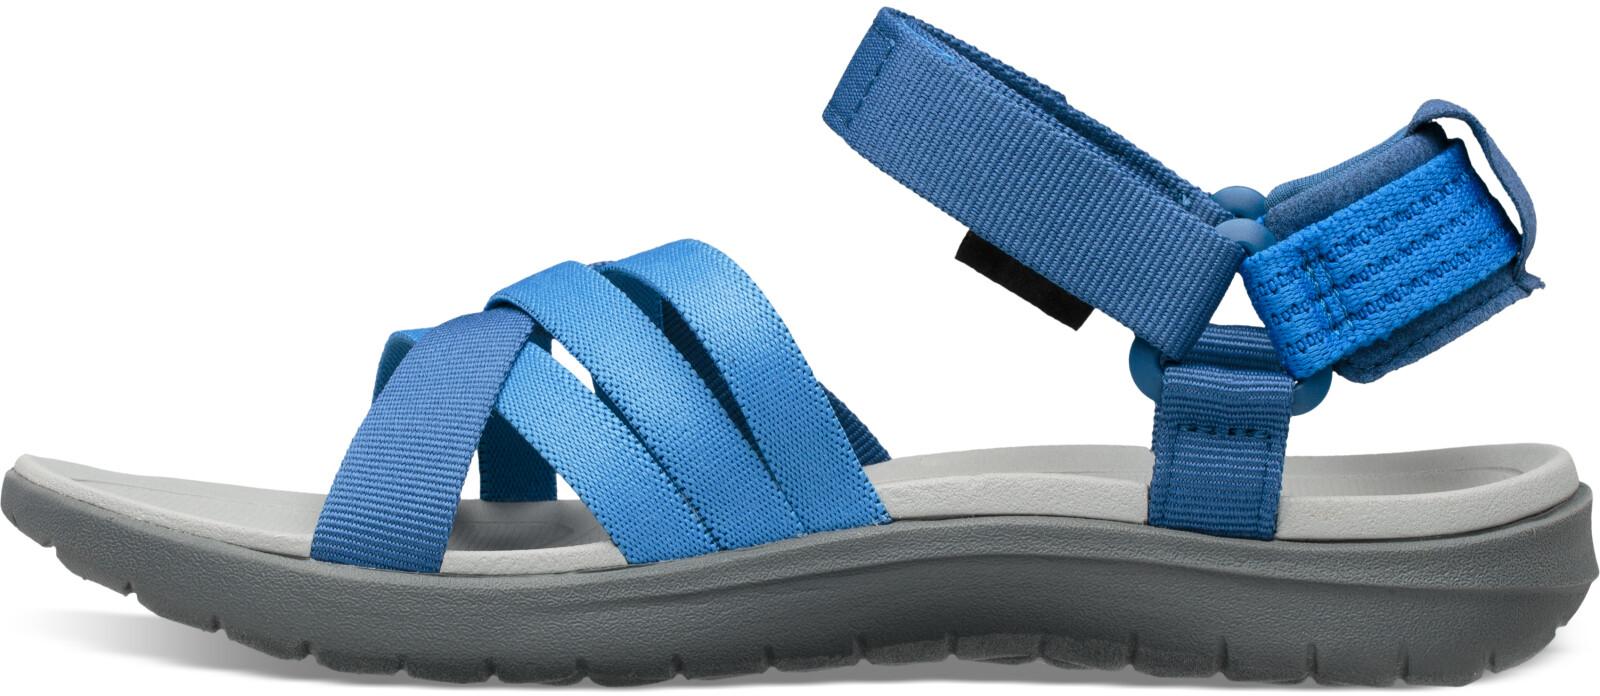 Teva Sanborn Sandalen Damen dark bluefrench blue